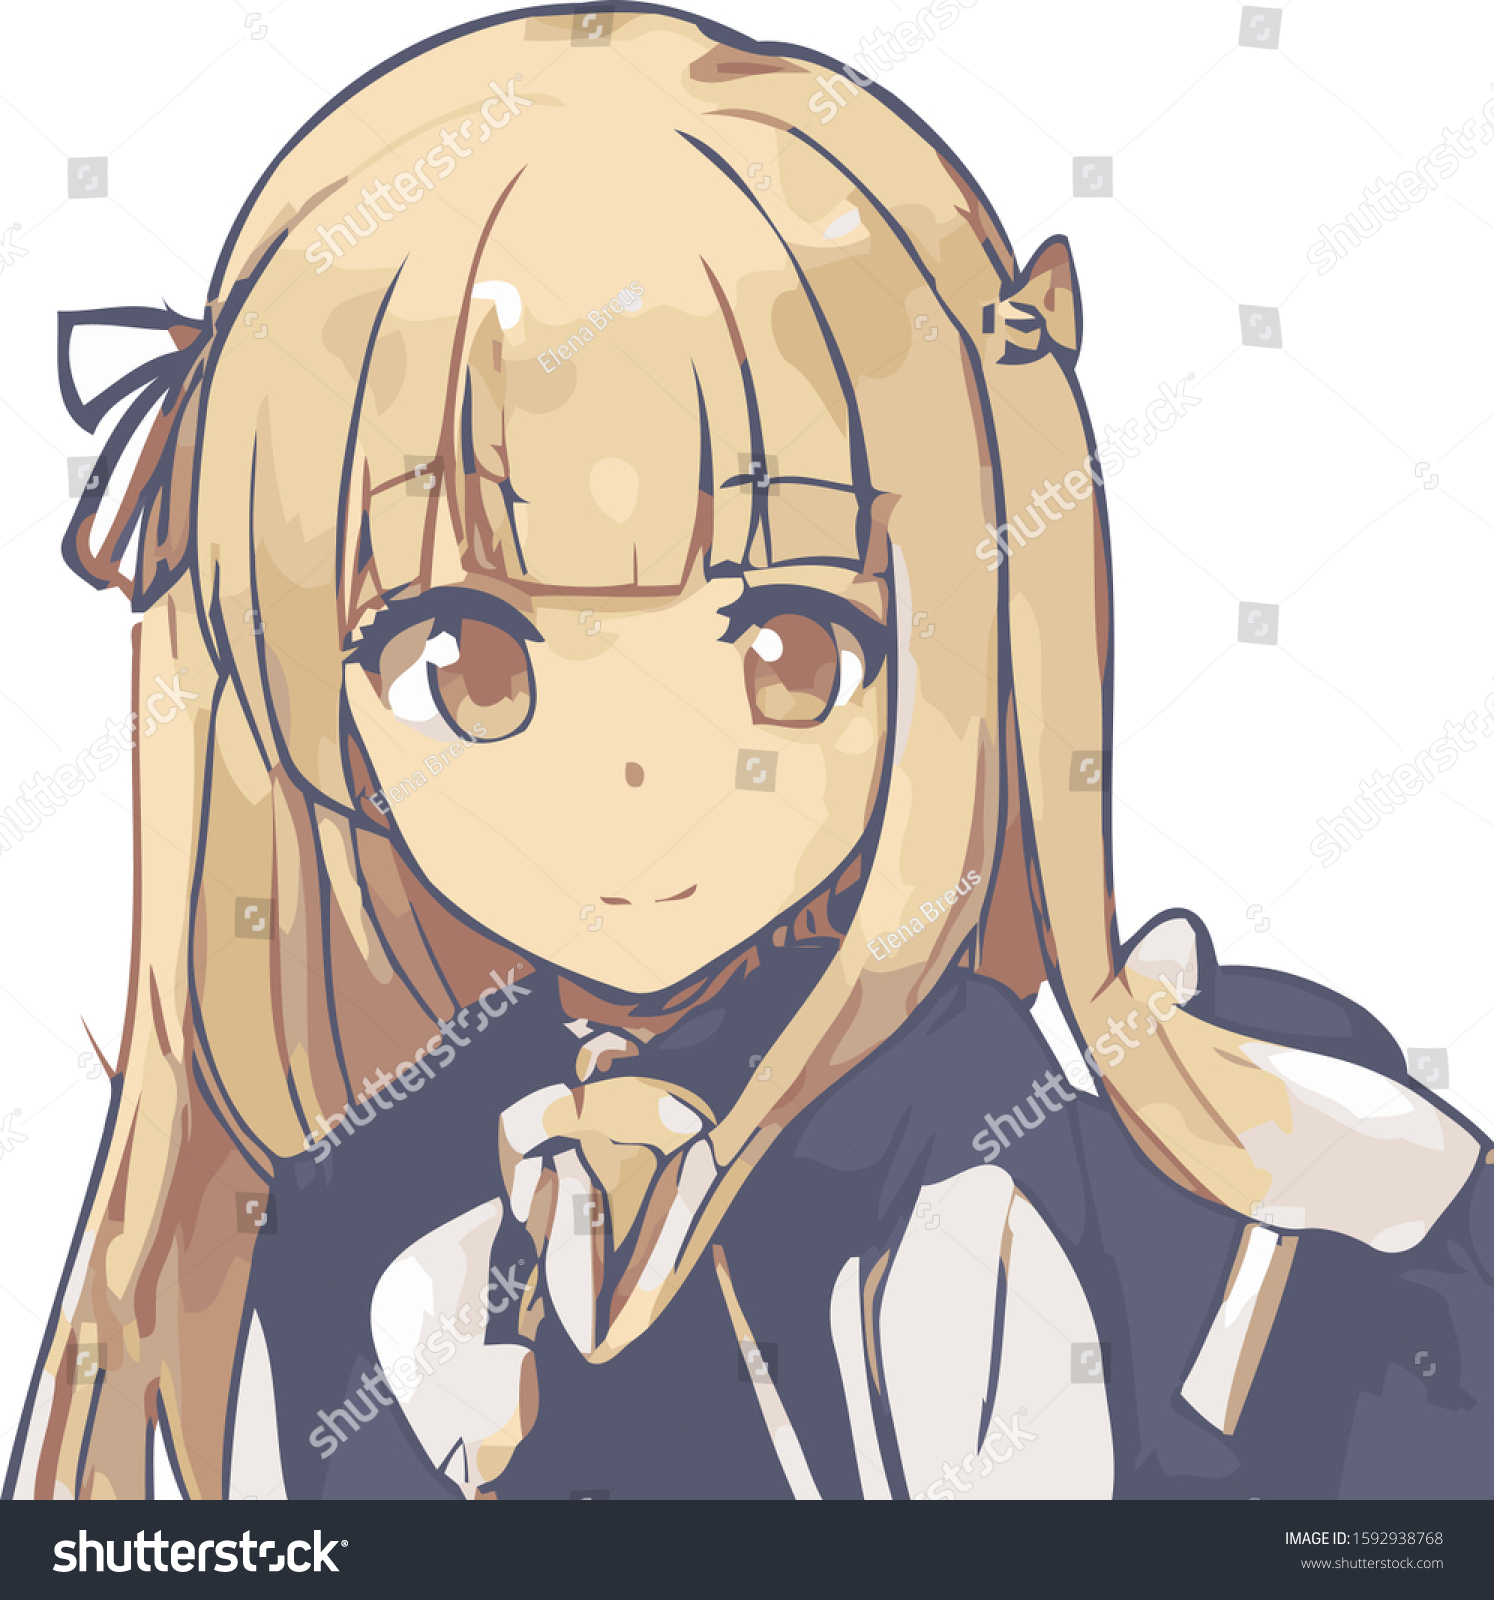 Anime blond girl